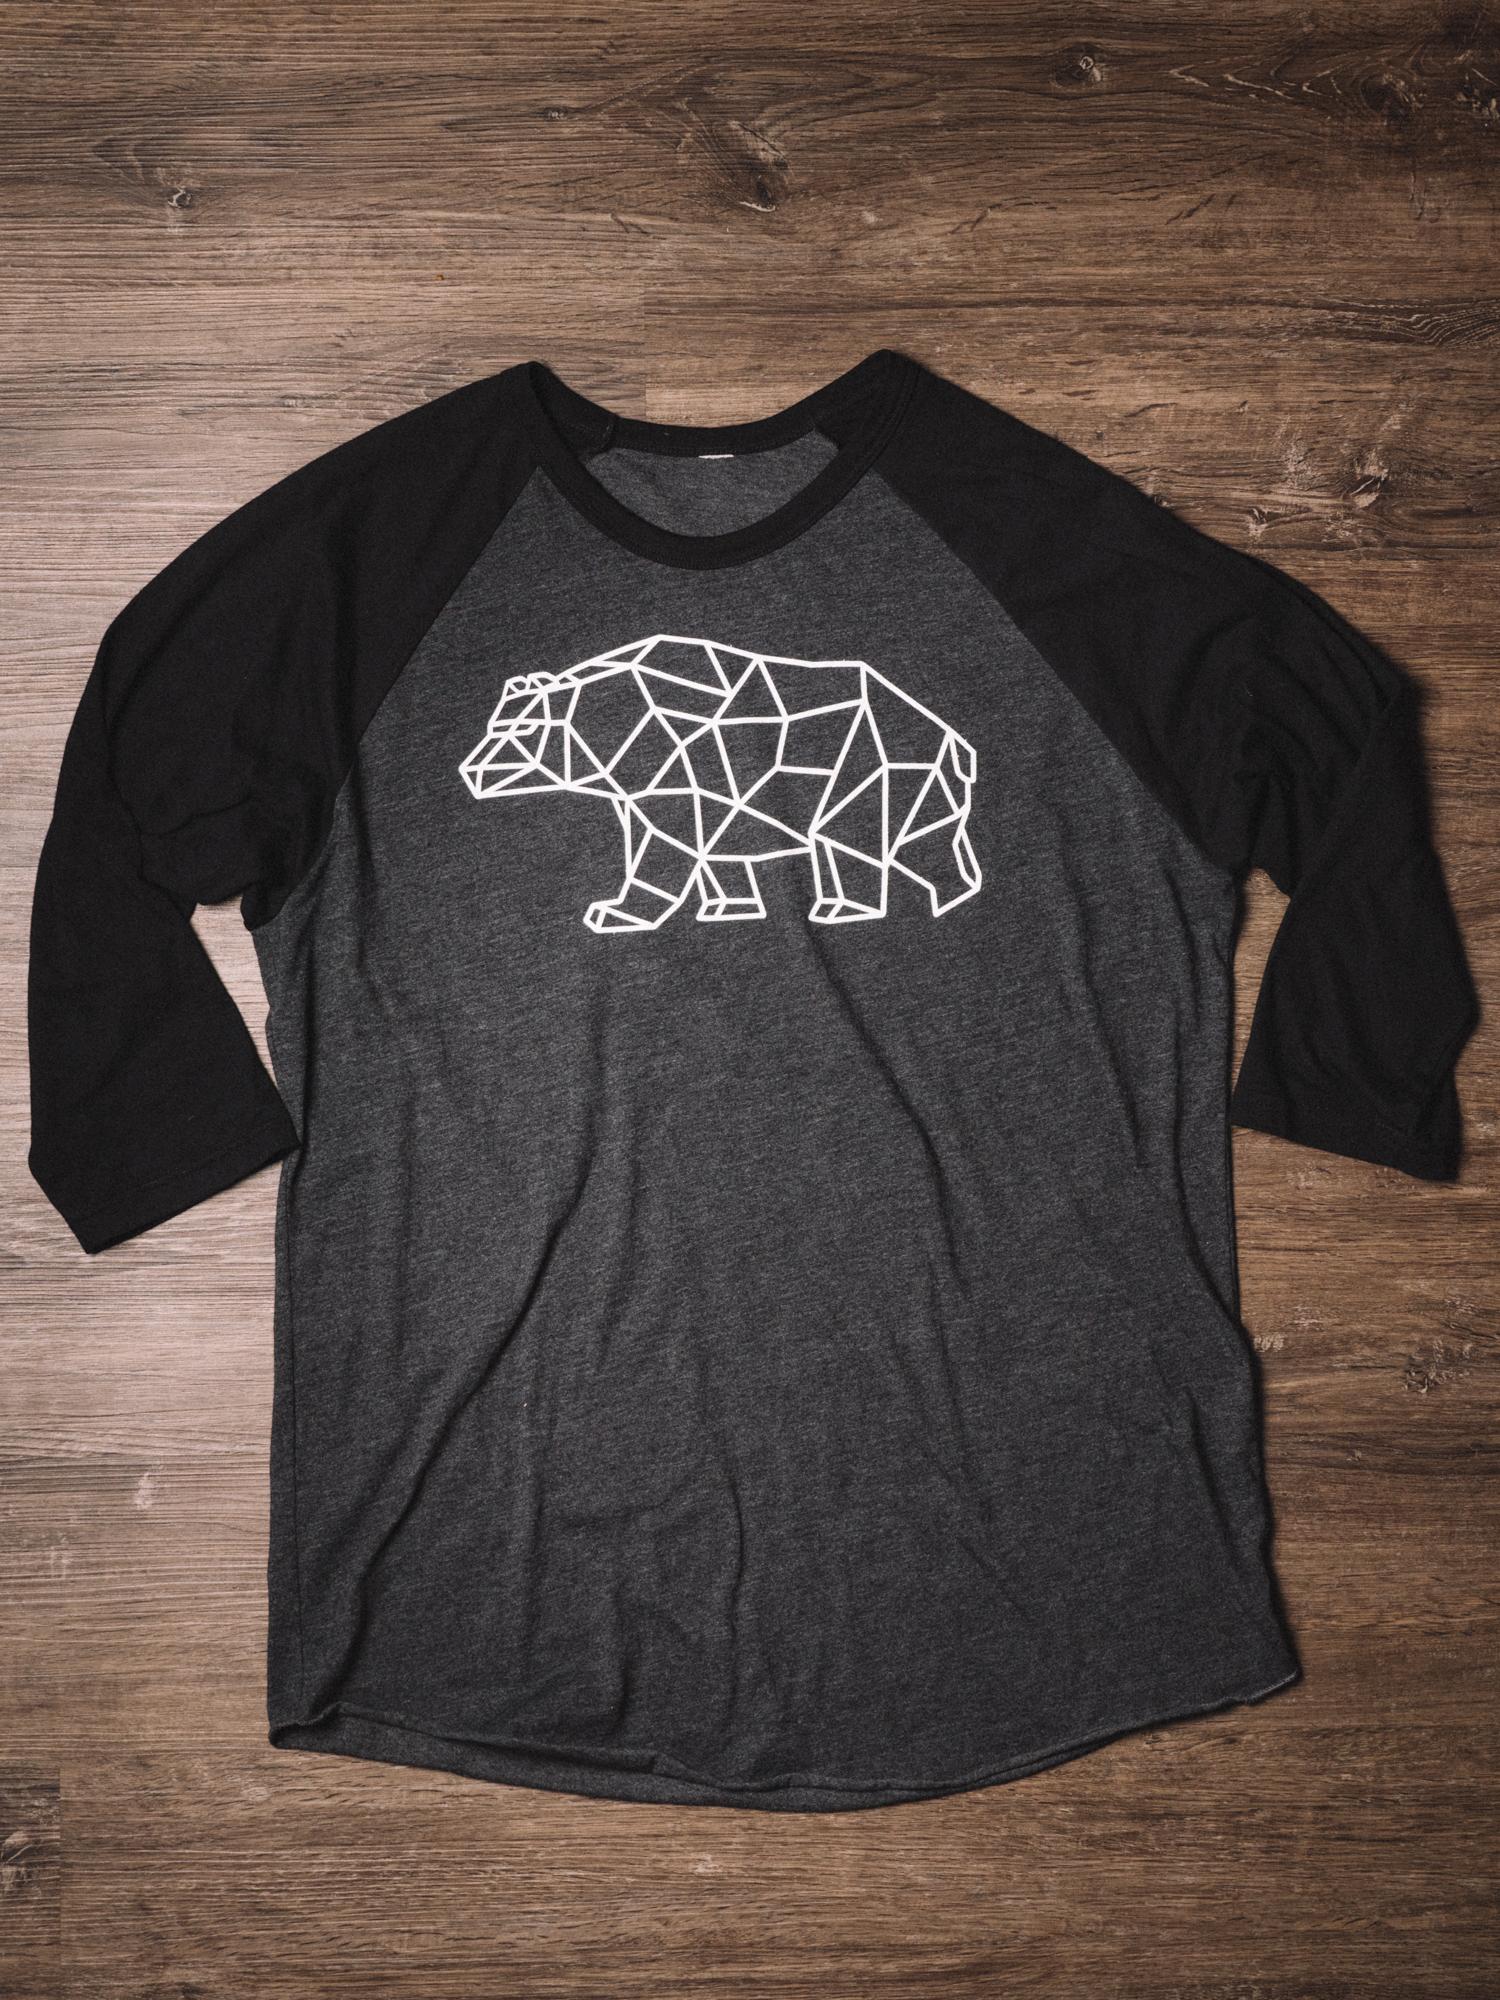 Leftcoast_Bear_3:4-shirt.jpg